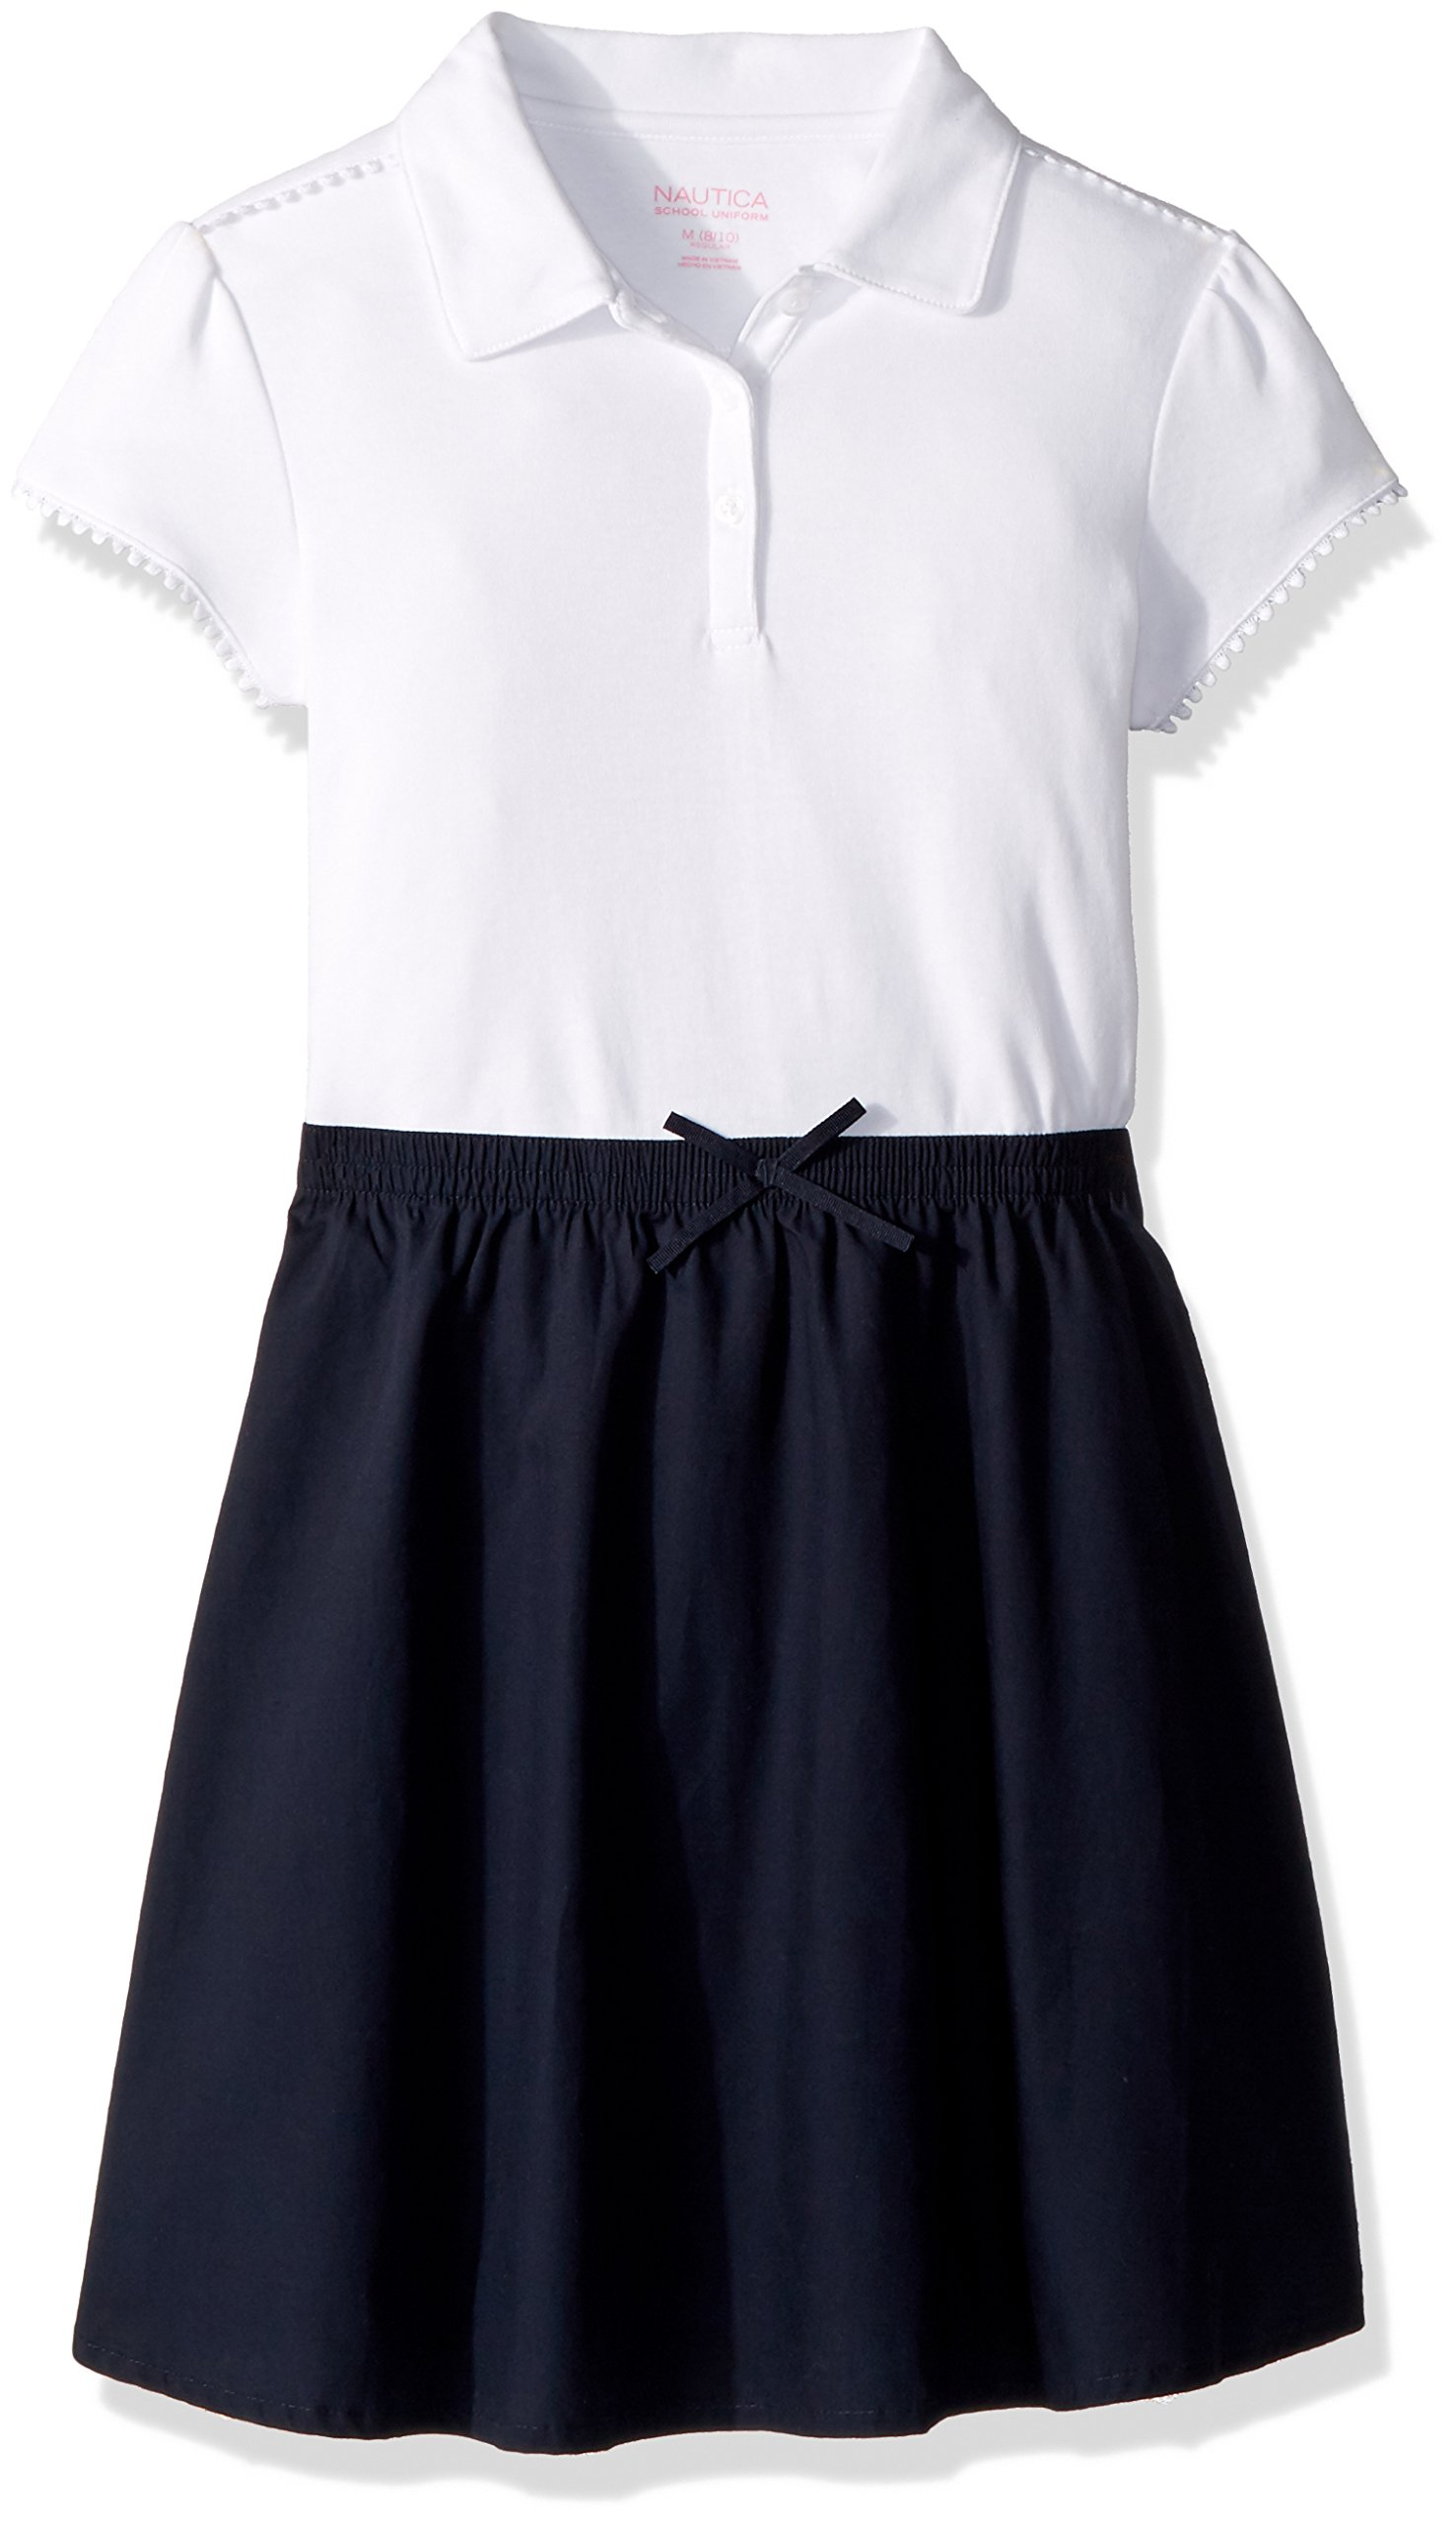 Nautica Girls' Big School Uniform Short Sleeve Polo Dress, Navy pom, X-Large(16)